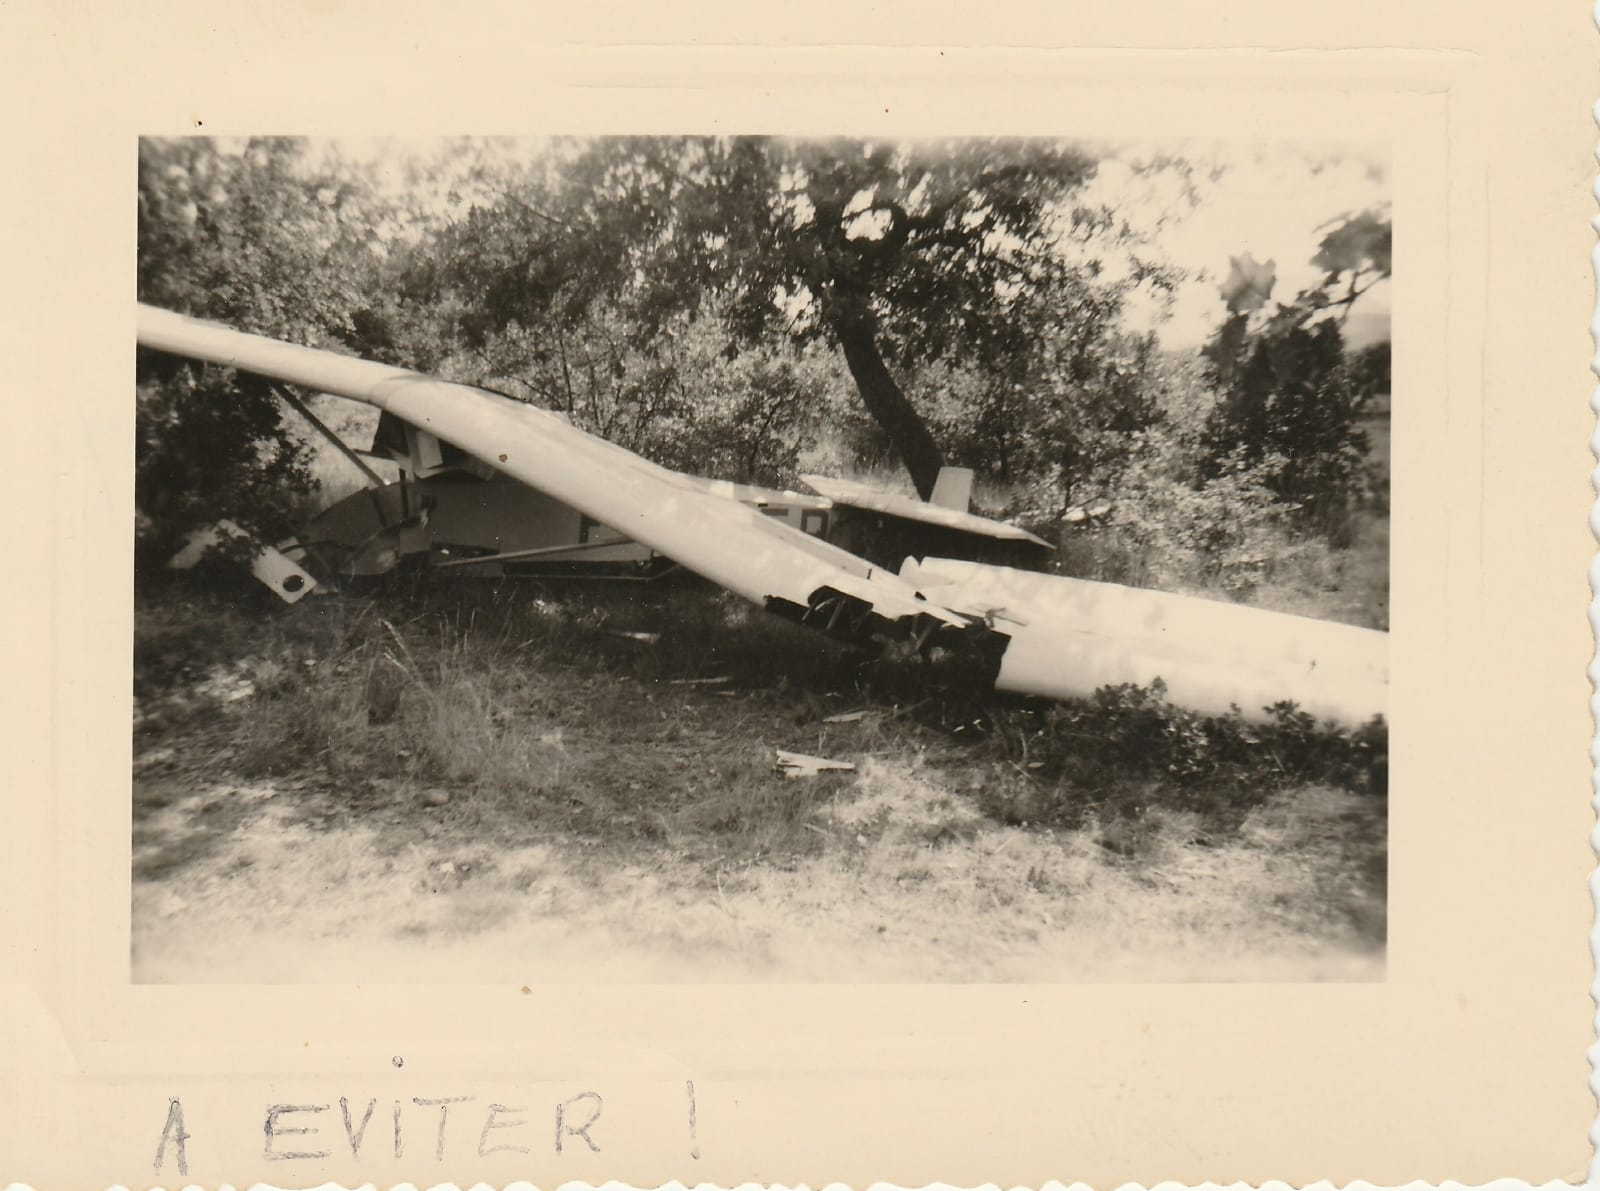 Nord 1300 n°96 Ray Ou Roy Saint Auban 9 août 1954 1